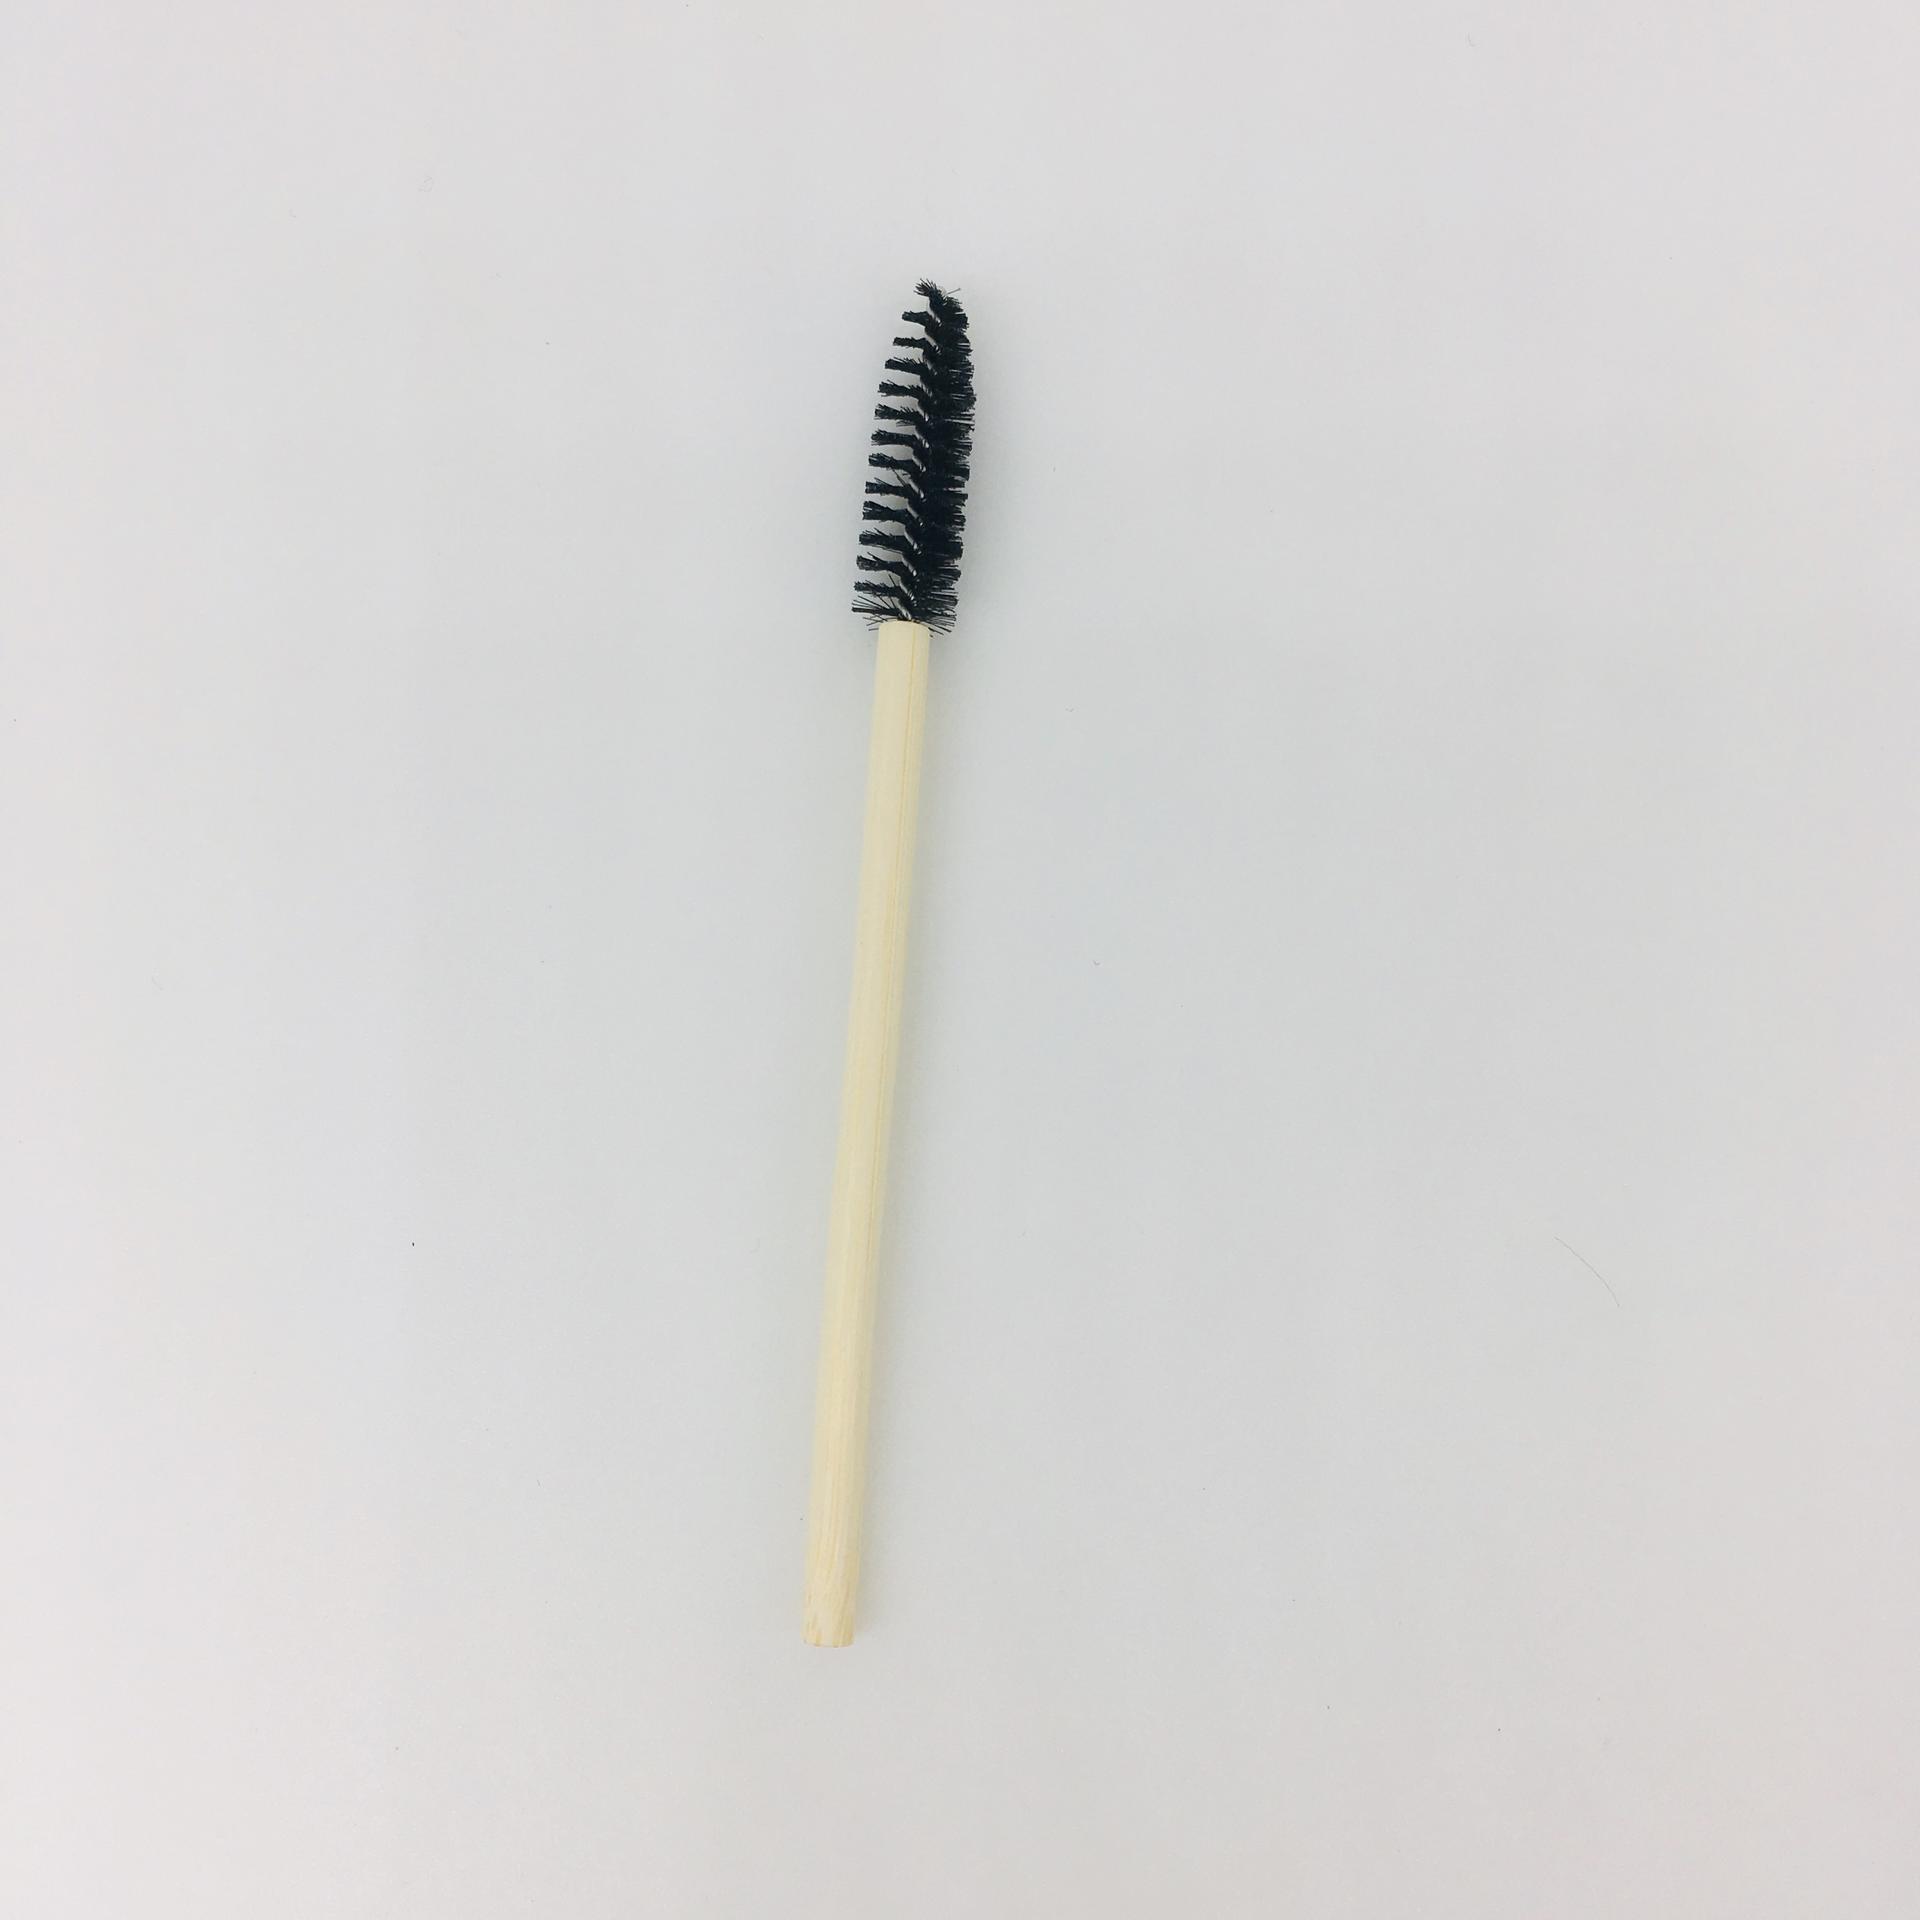 Disposable makeup applicator bamboo handle mascara brush eco-friendly degradable bamboo mascara wand